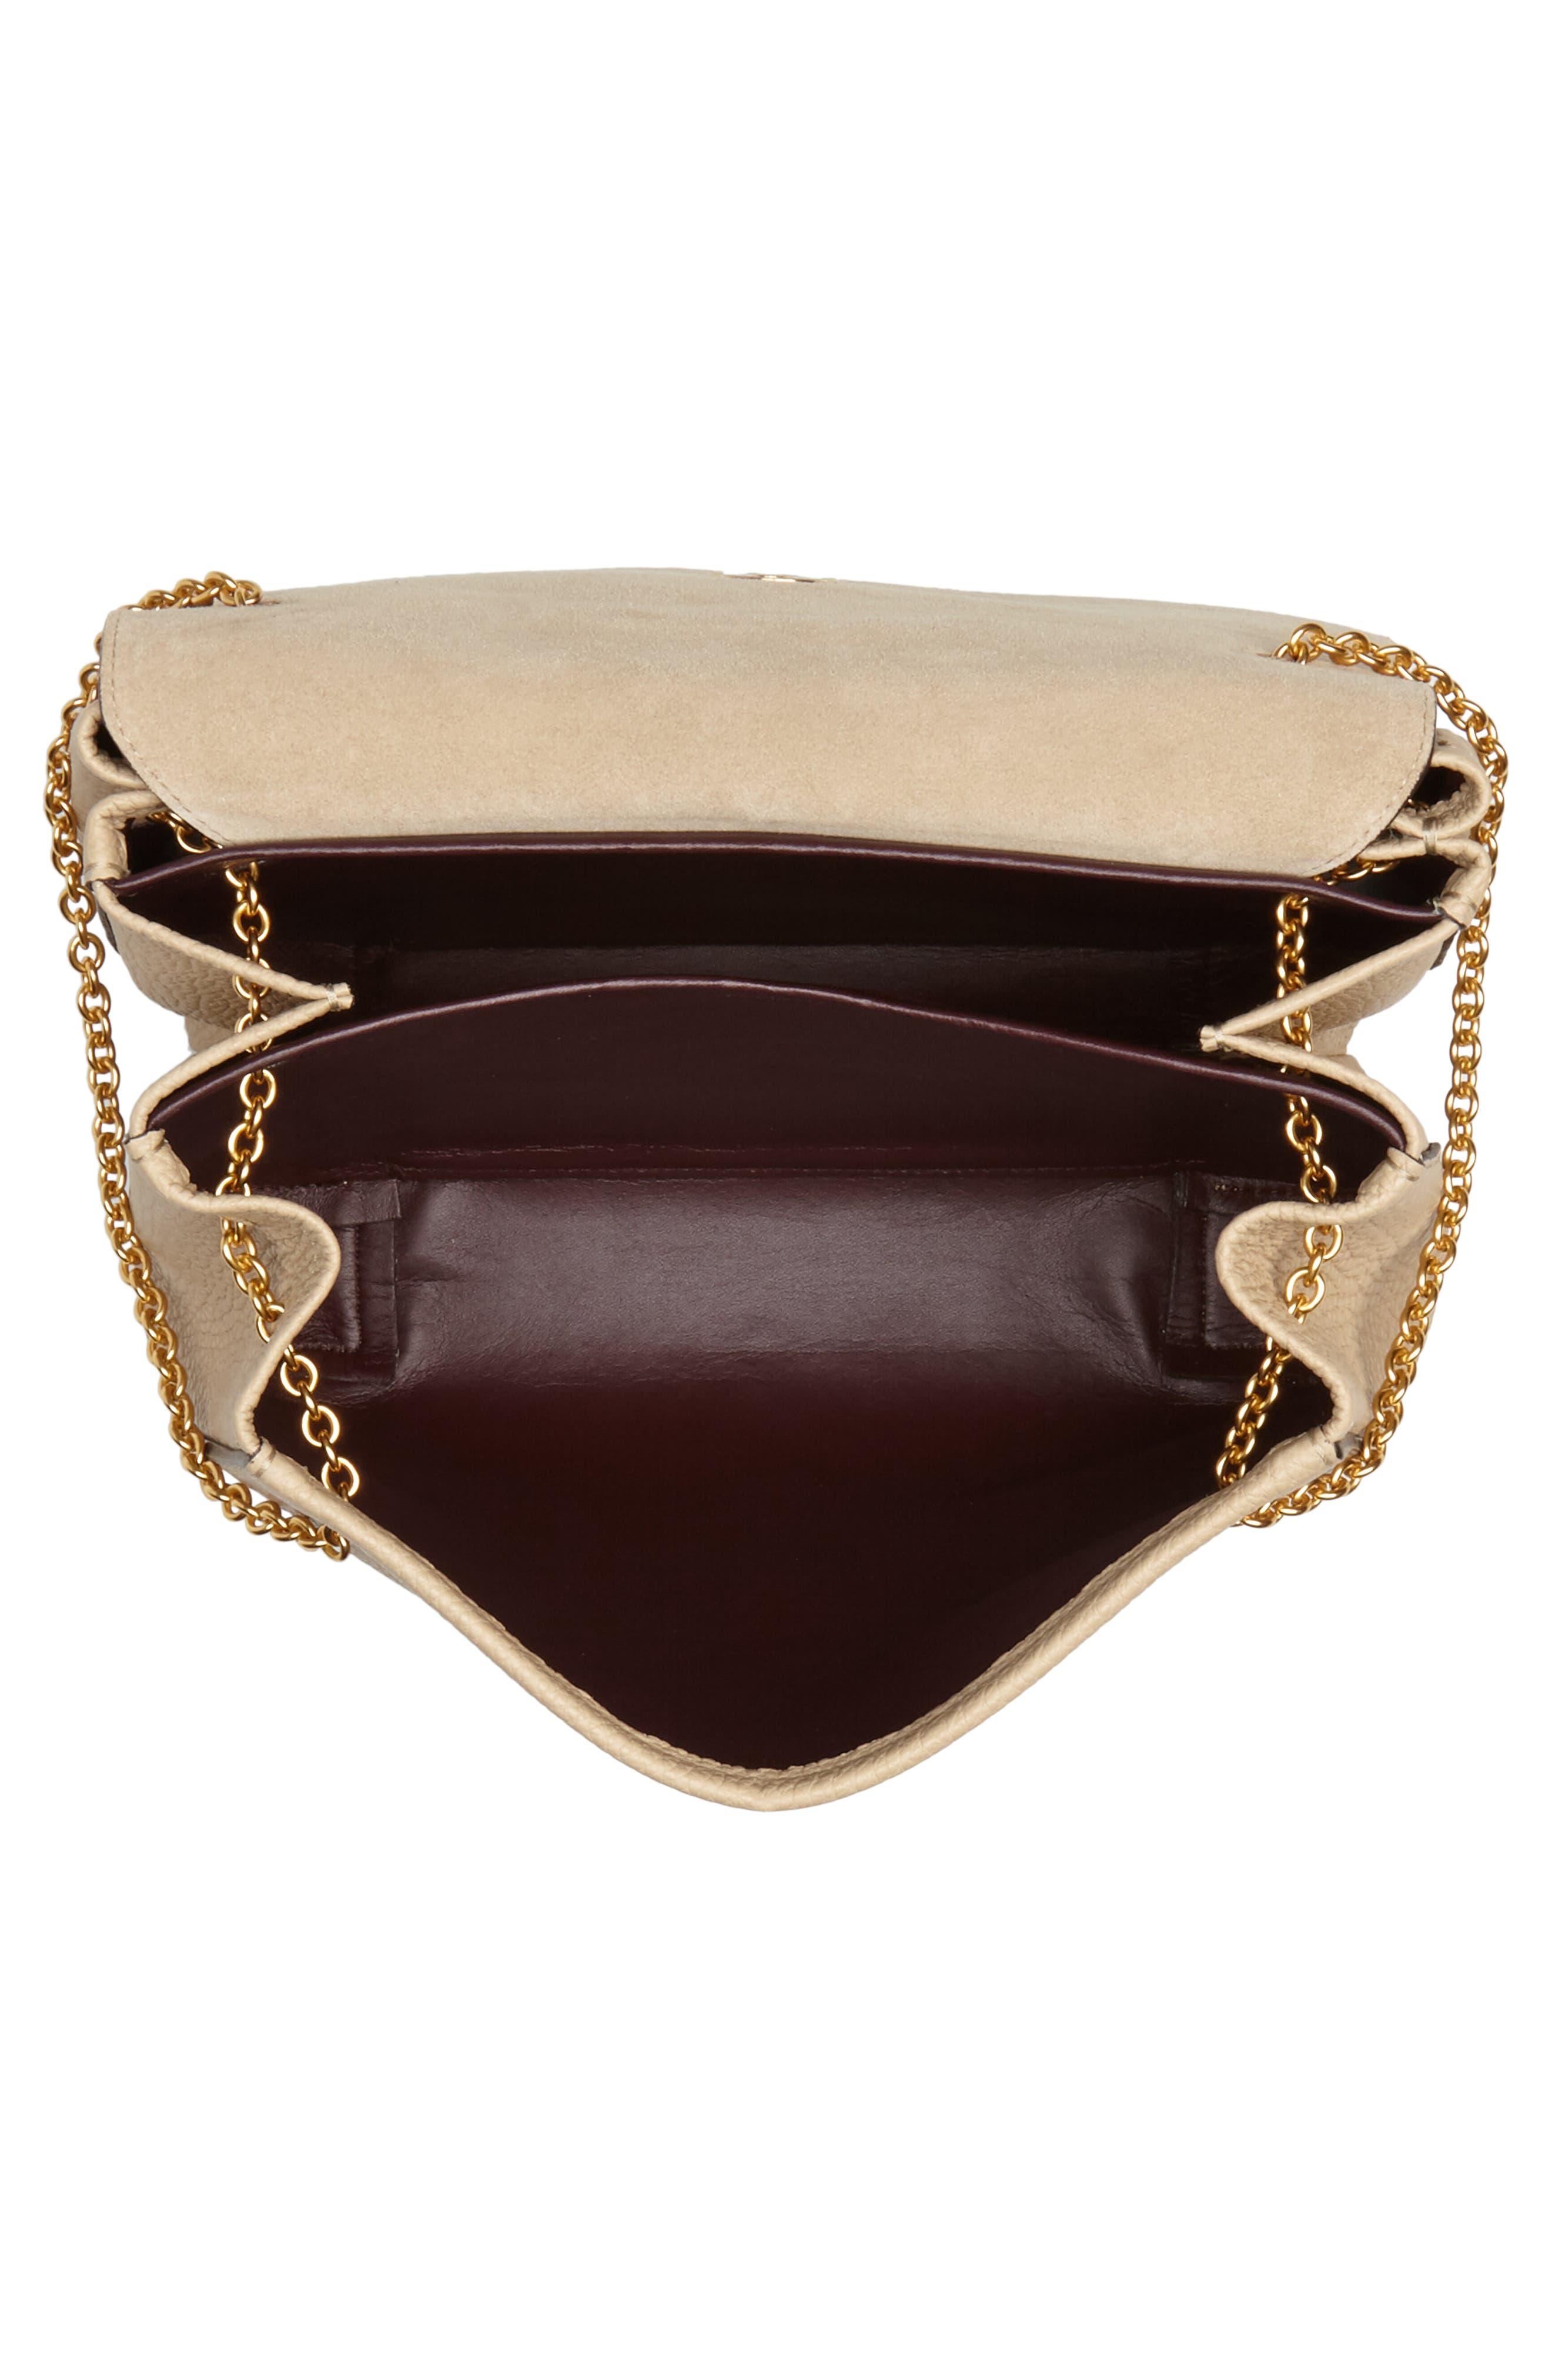 Marloes Grained Calfskin Leather Satchel,                             Alternate thumbnail 4, color,                             LIGHT DUNE